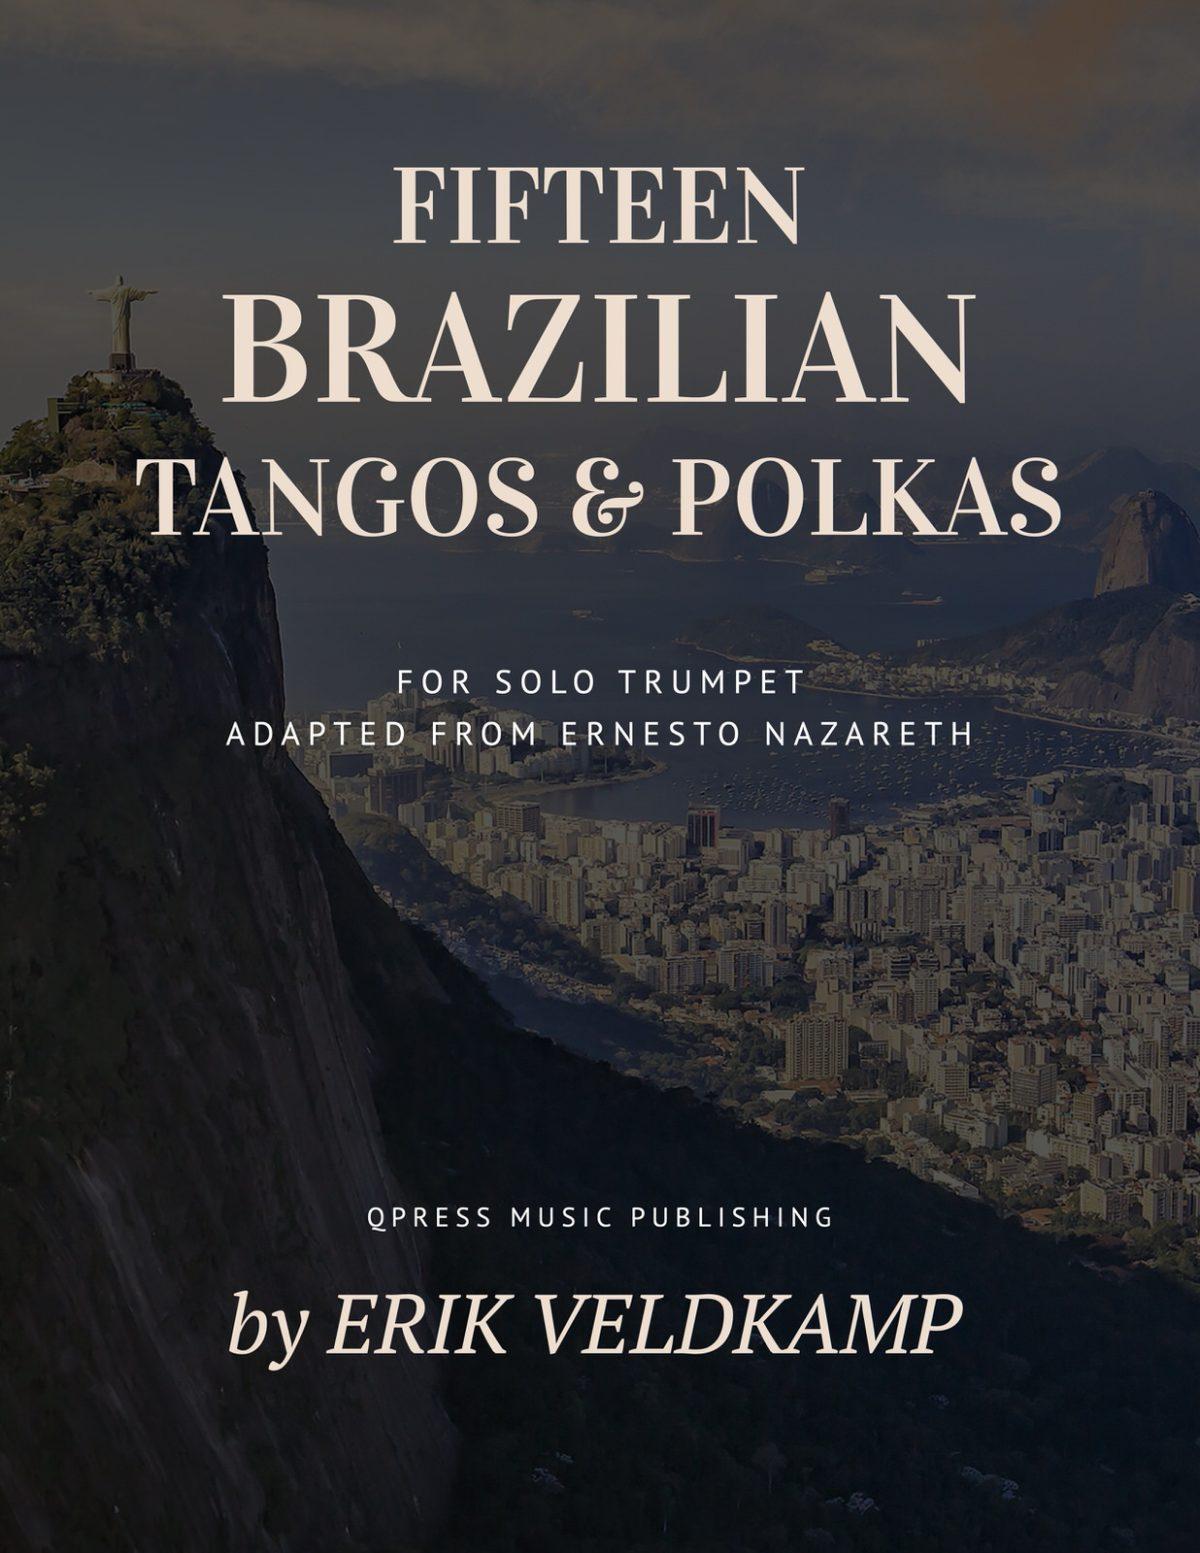 Veldkamp-Nazareth, 15 Brazilian Tangos & Polkas for Trumpet-p01